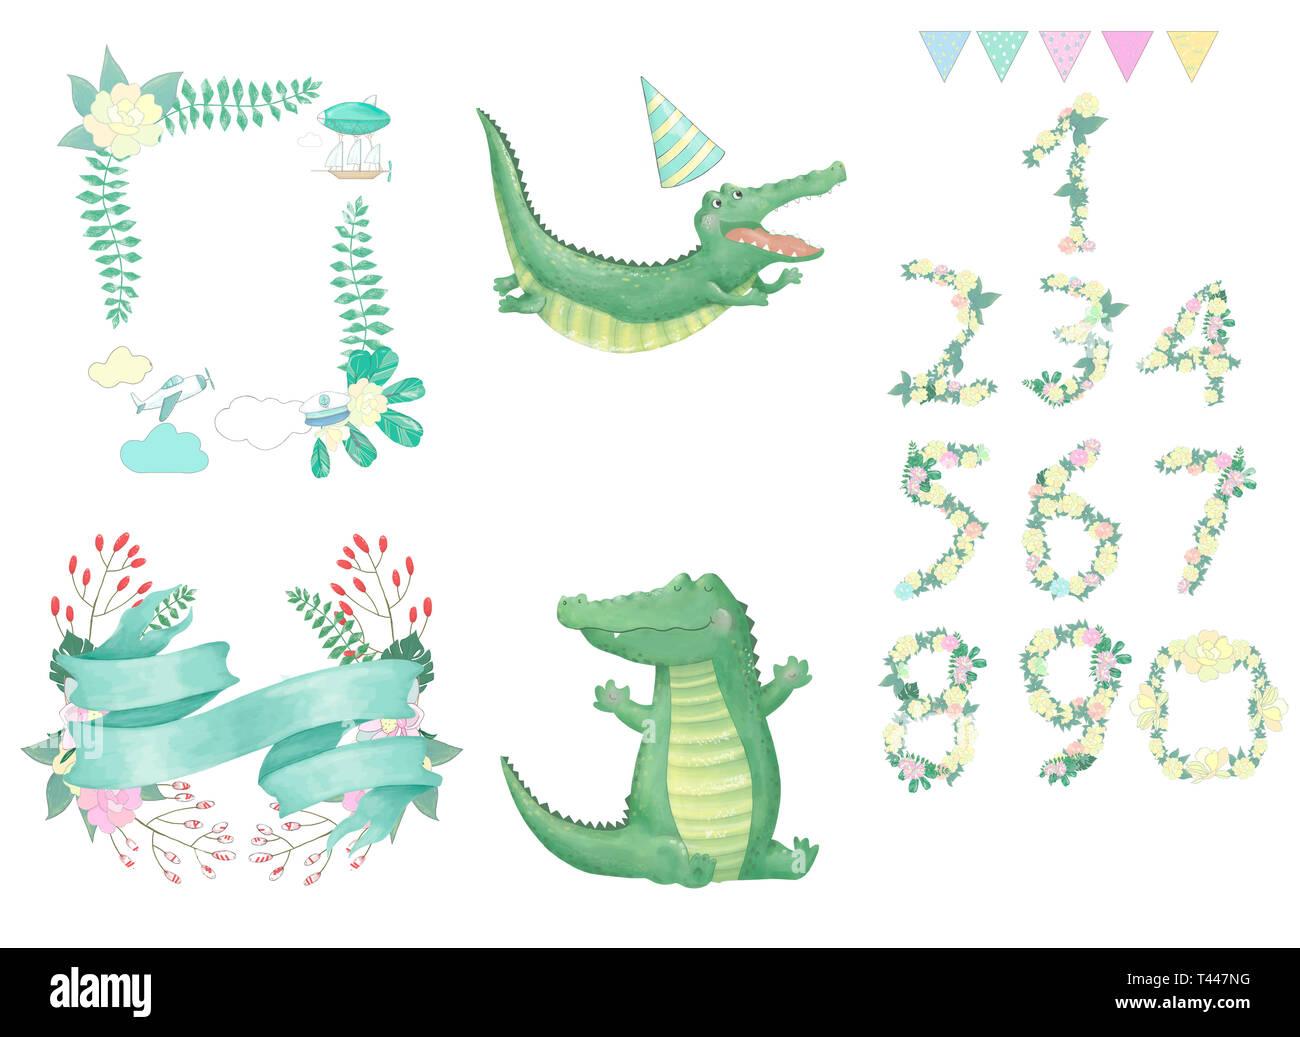 crocodile digital clip art cute animal drawing - Stock Image